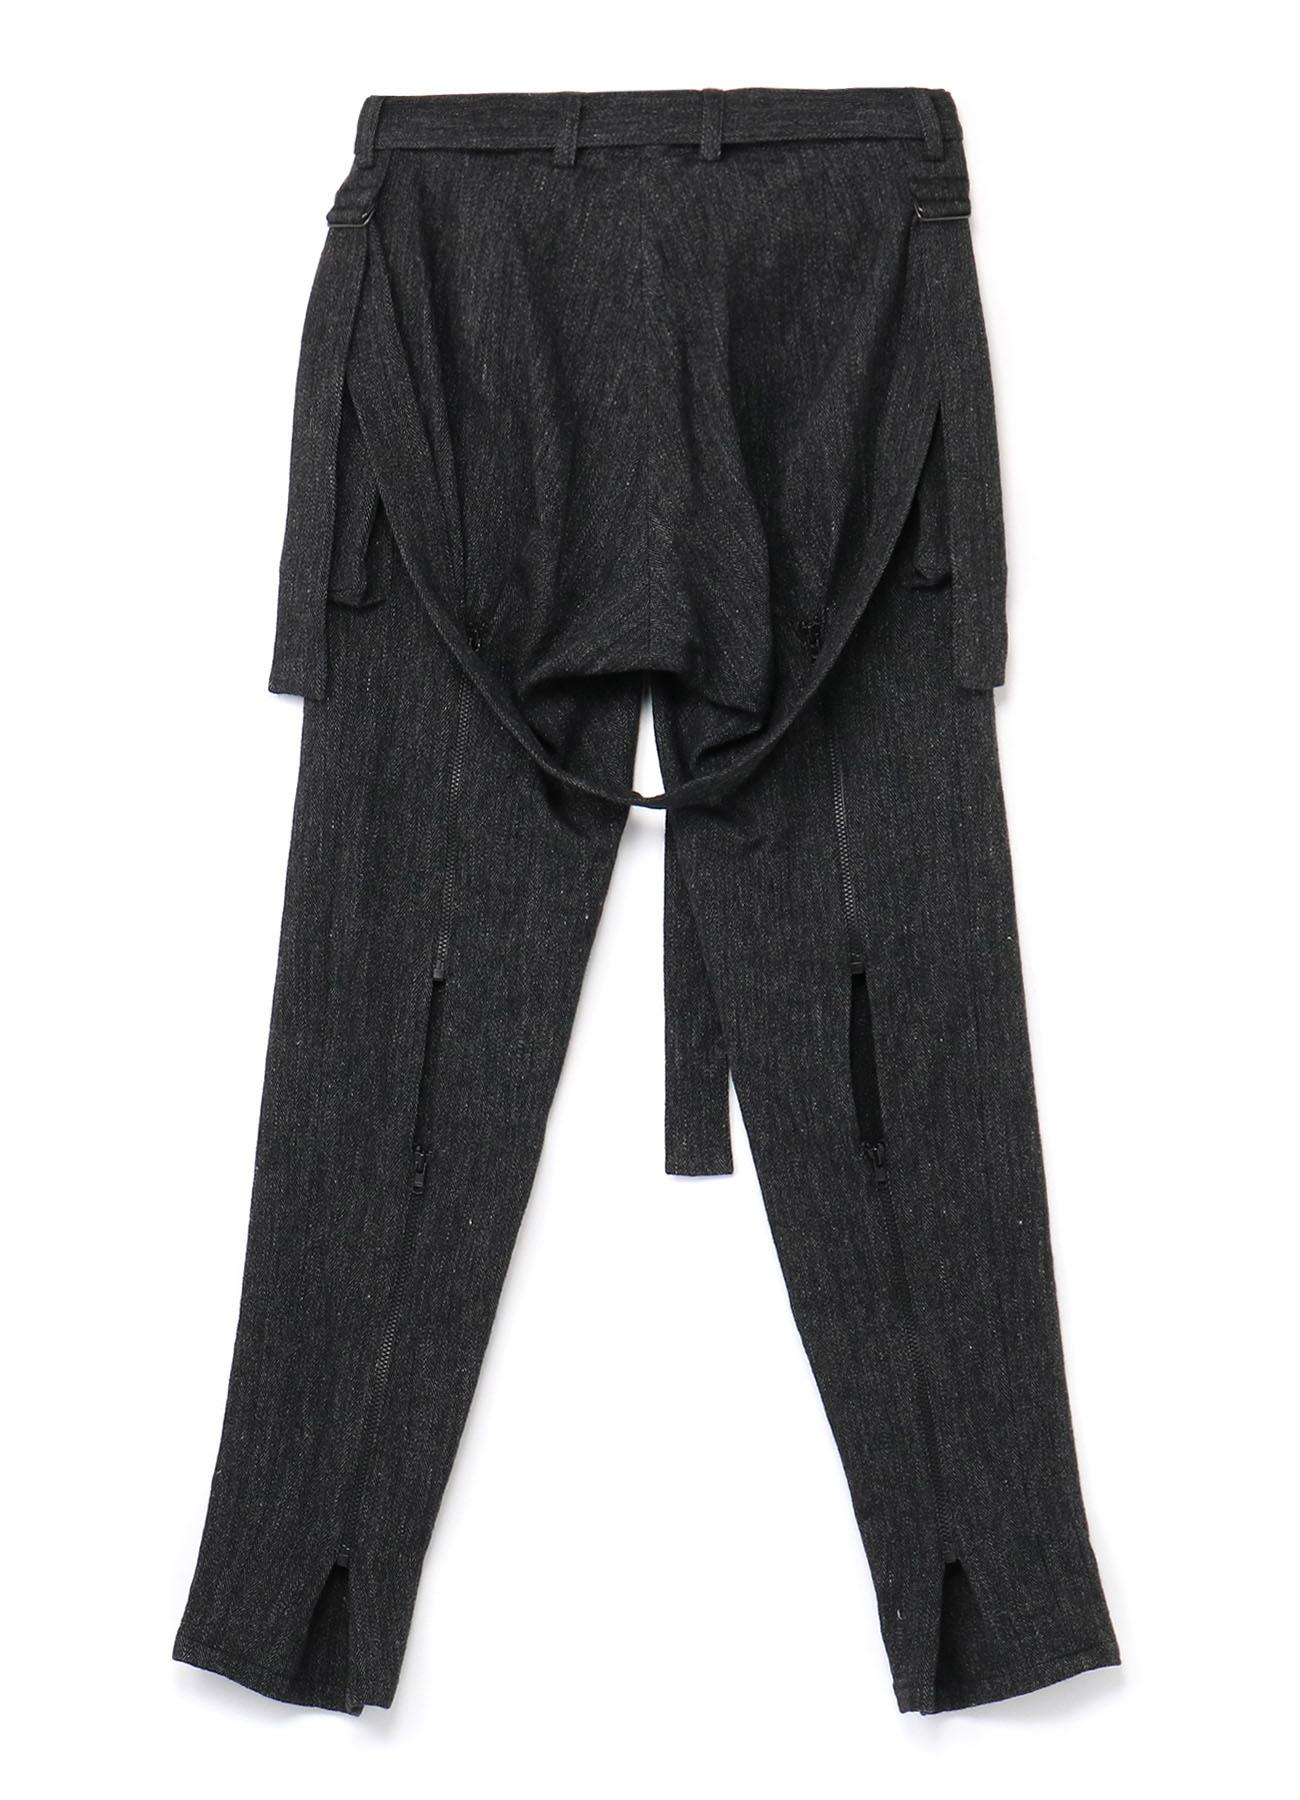 Li/W Herringbone Long Tape Pants